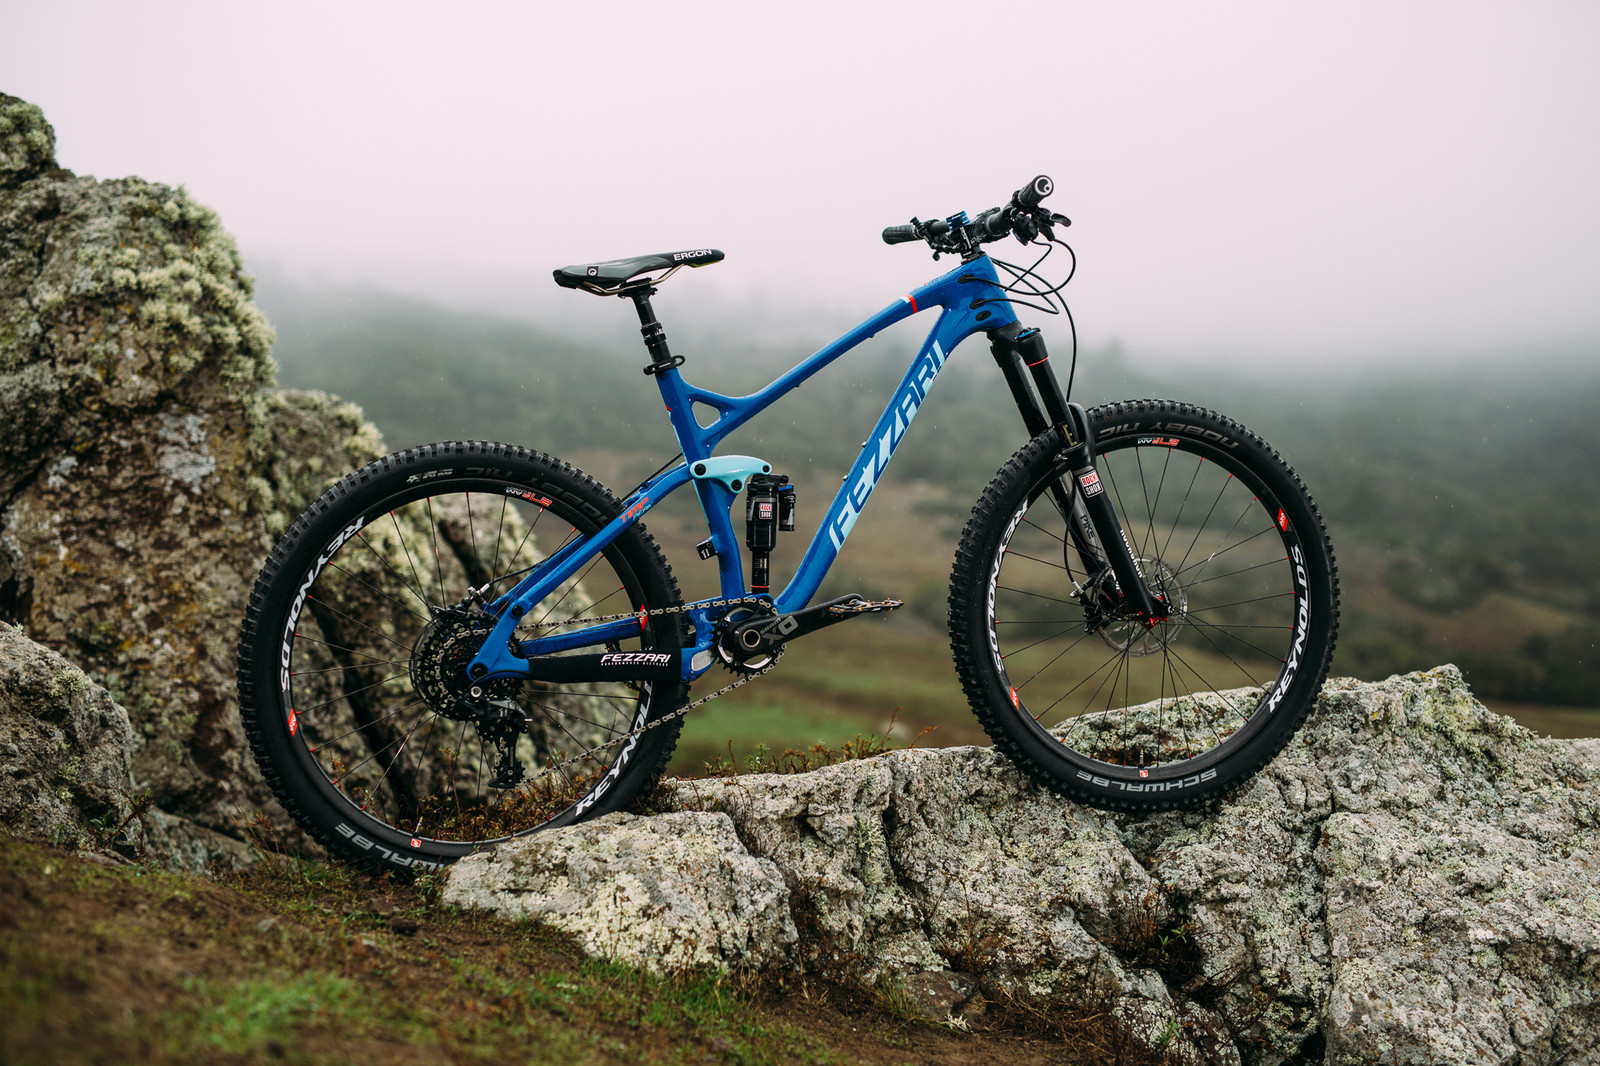 2015 Fezzari Timp Peak X01 - 2015 Test Sessions: Fezzari Timp Peak X01 - Mountain Biking Pictures - Vital MTB